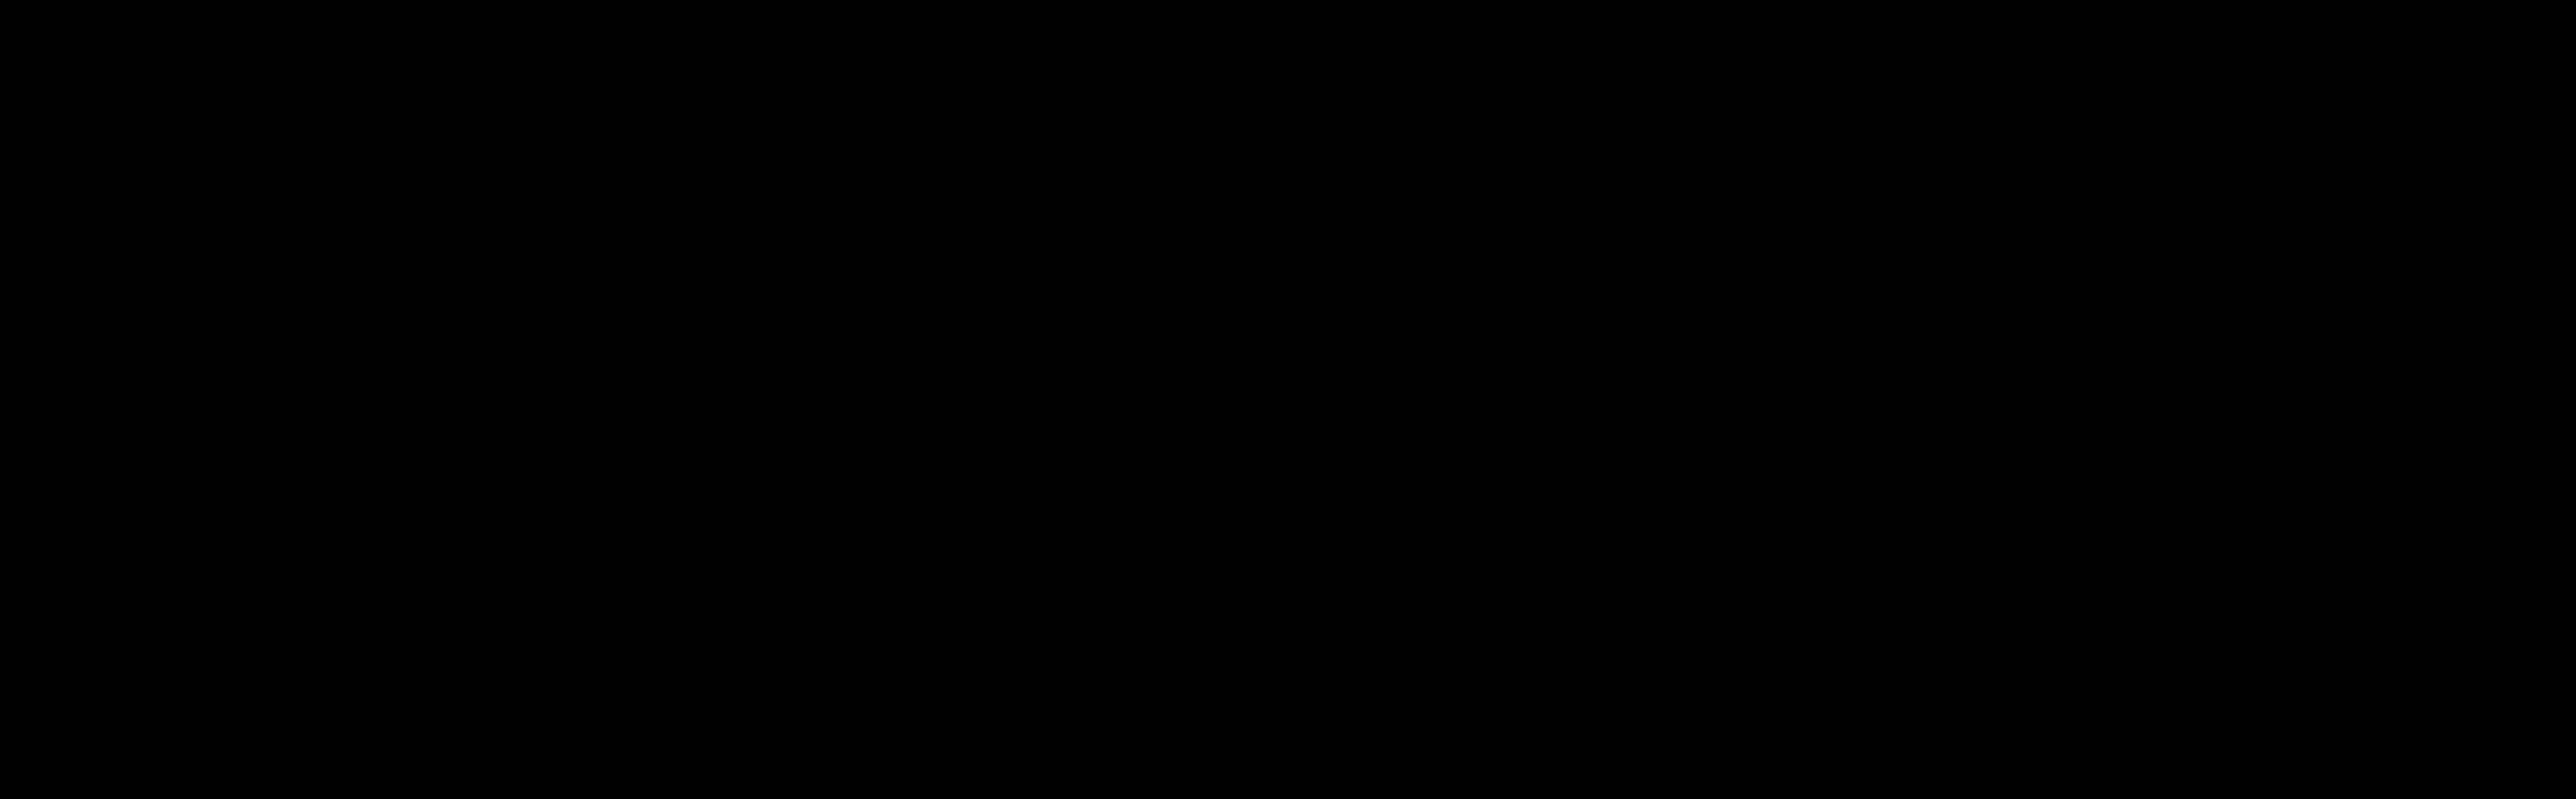 Daclatasvir-<sup>13</sup>C<sub>10</sub>